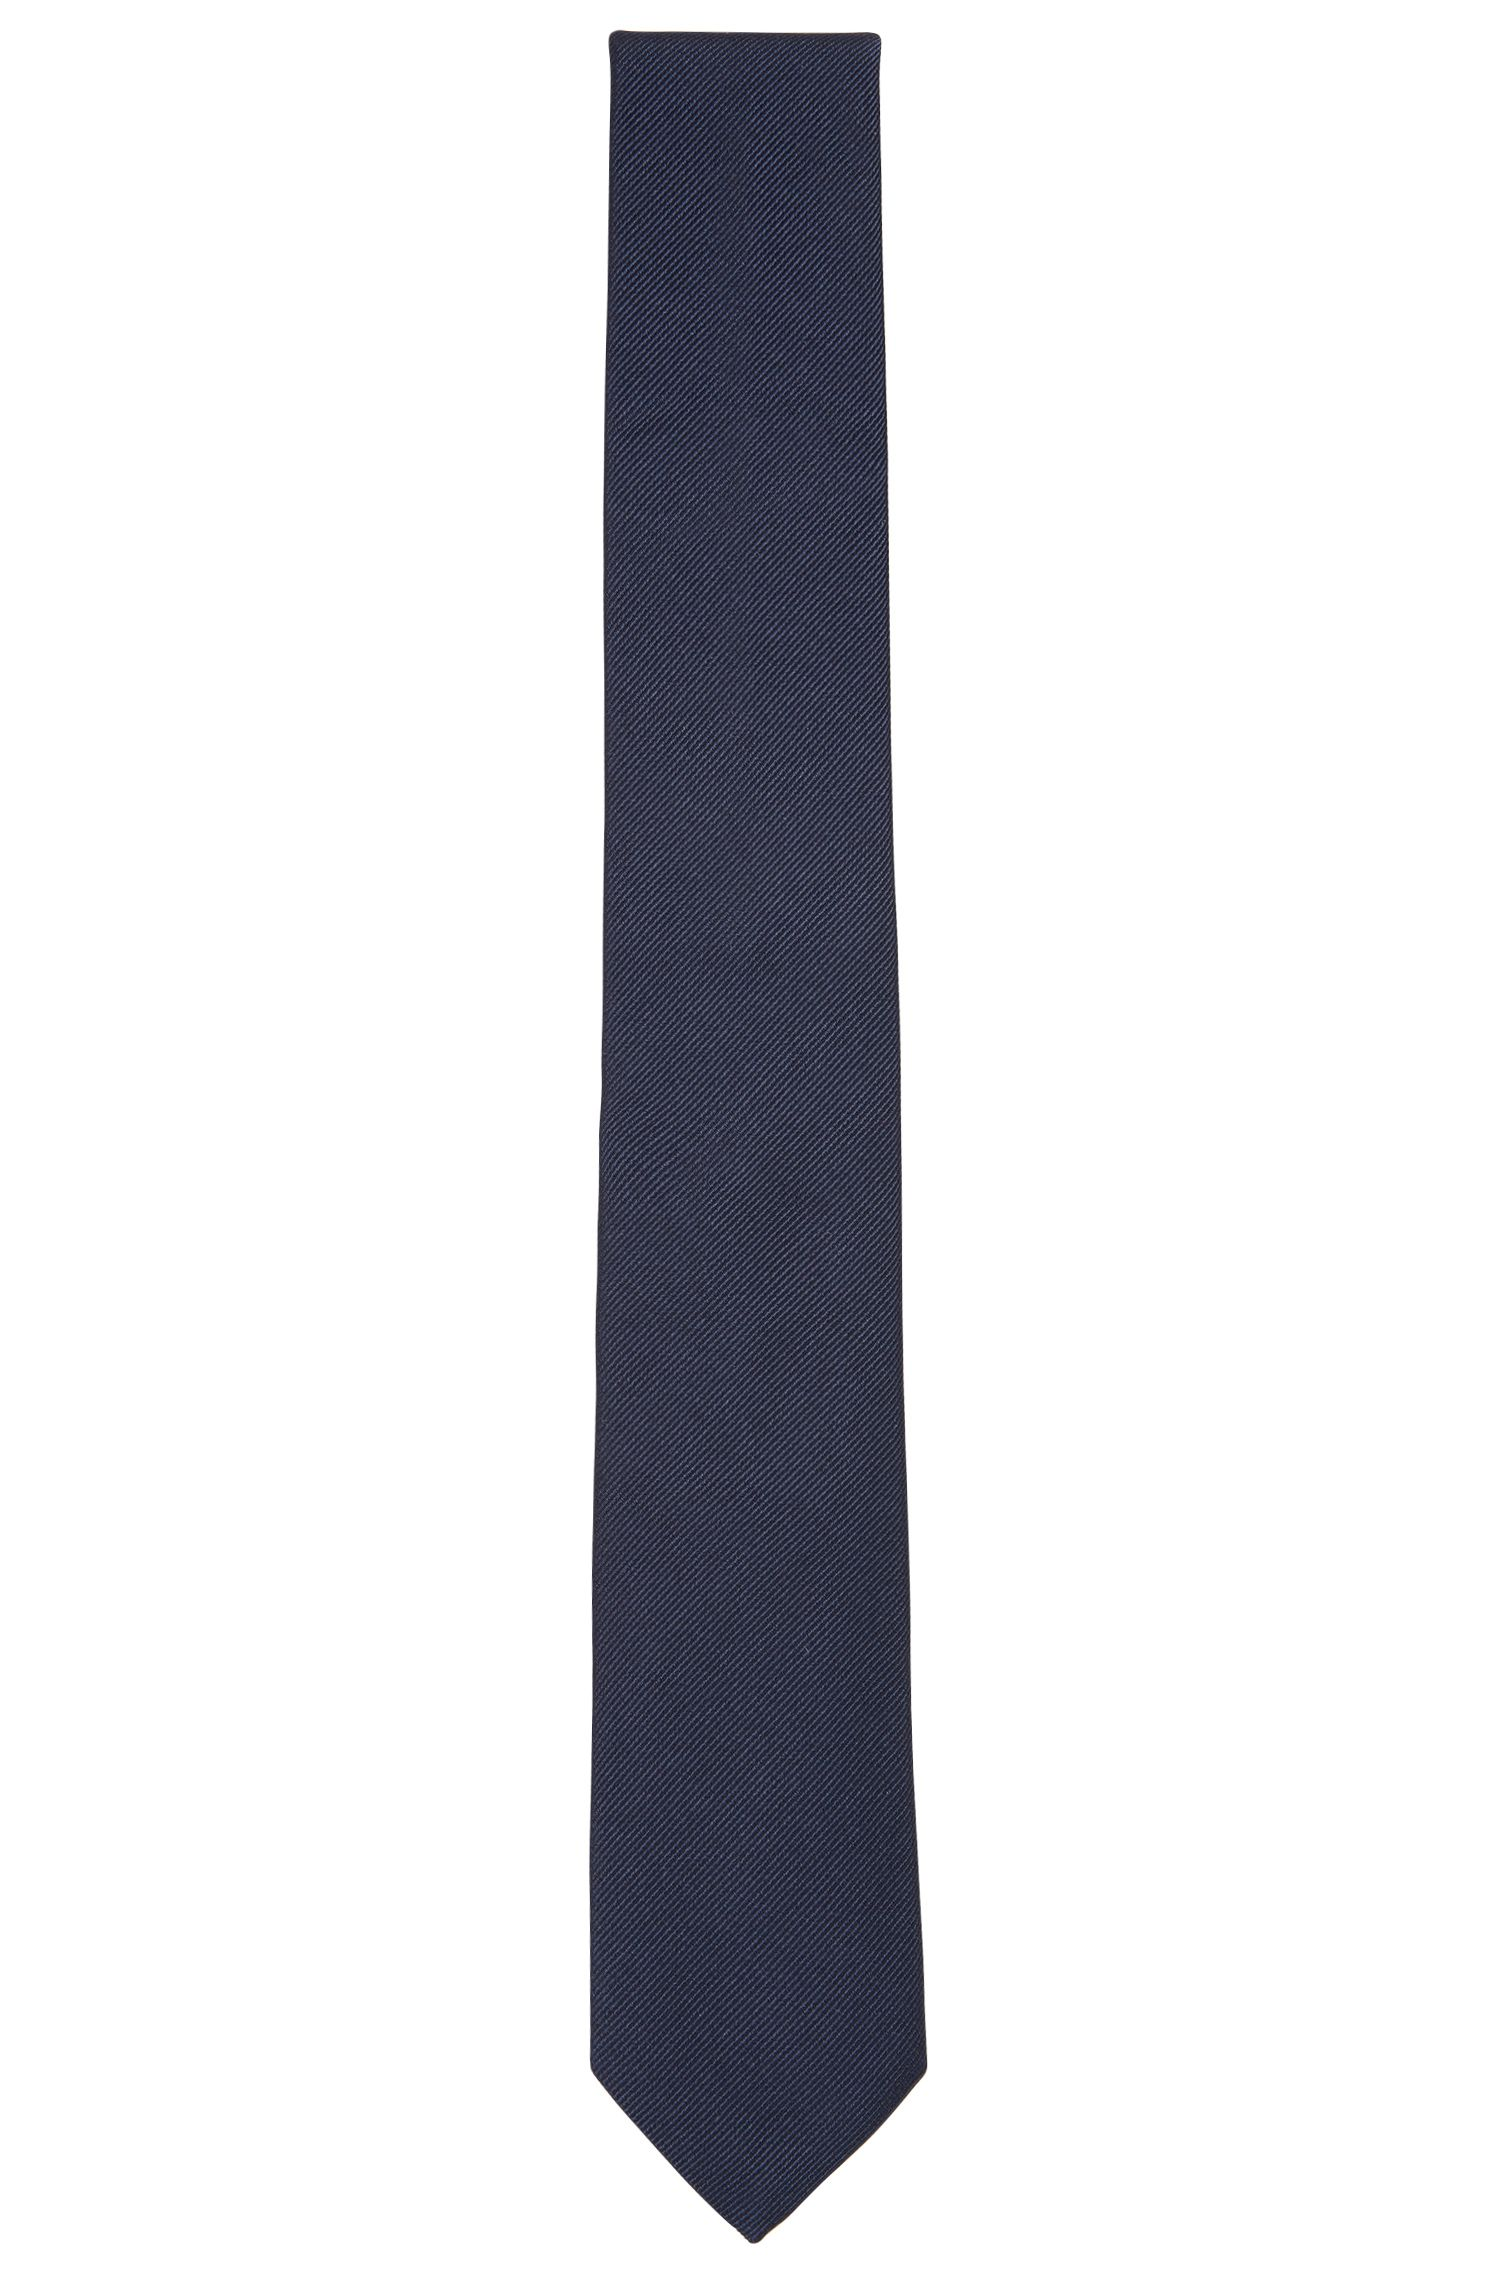 BOSS Tailored Italian Silk Twill Slim Tie